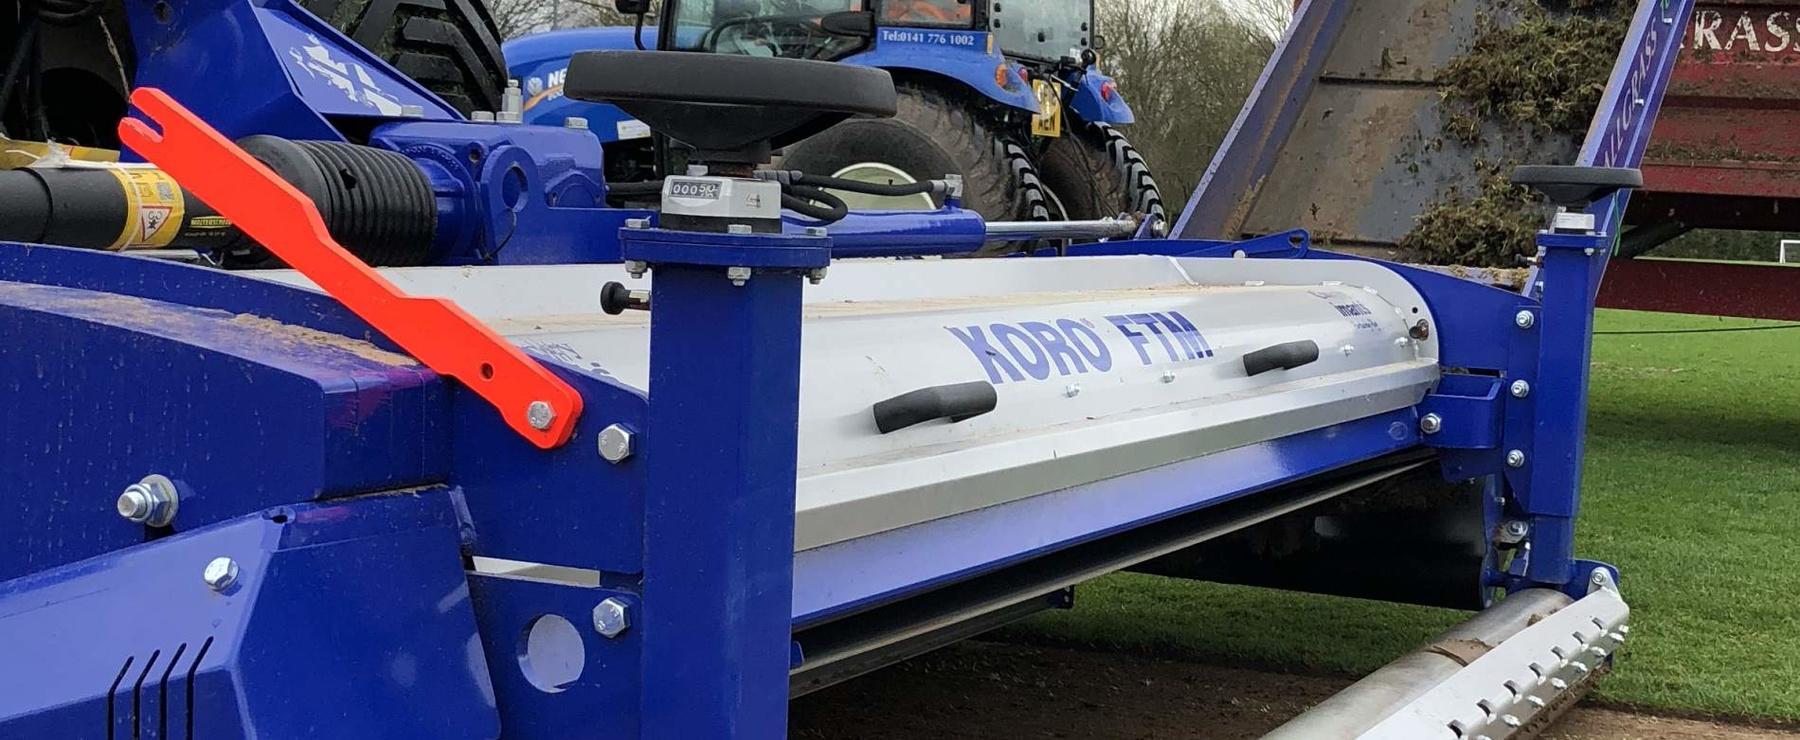 ALLGrass invest in new Koro cropFTM (1)